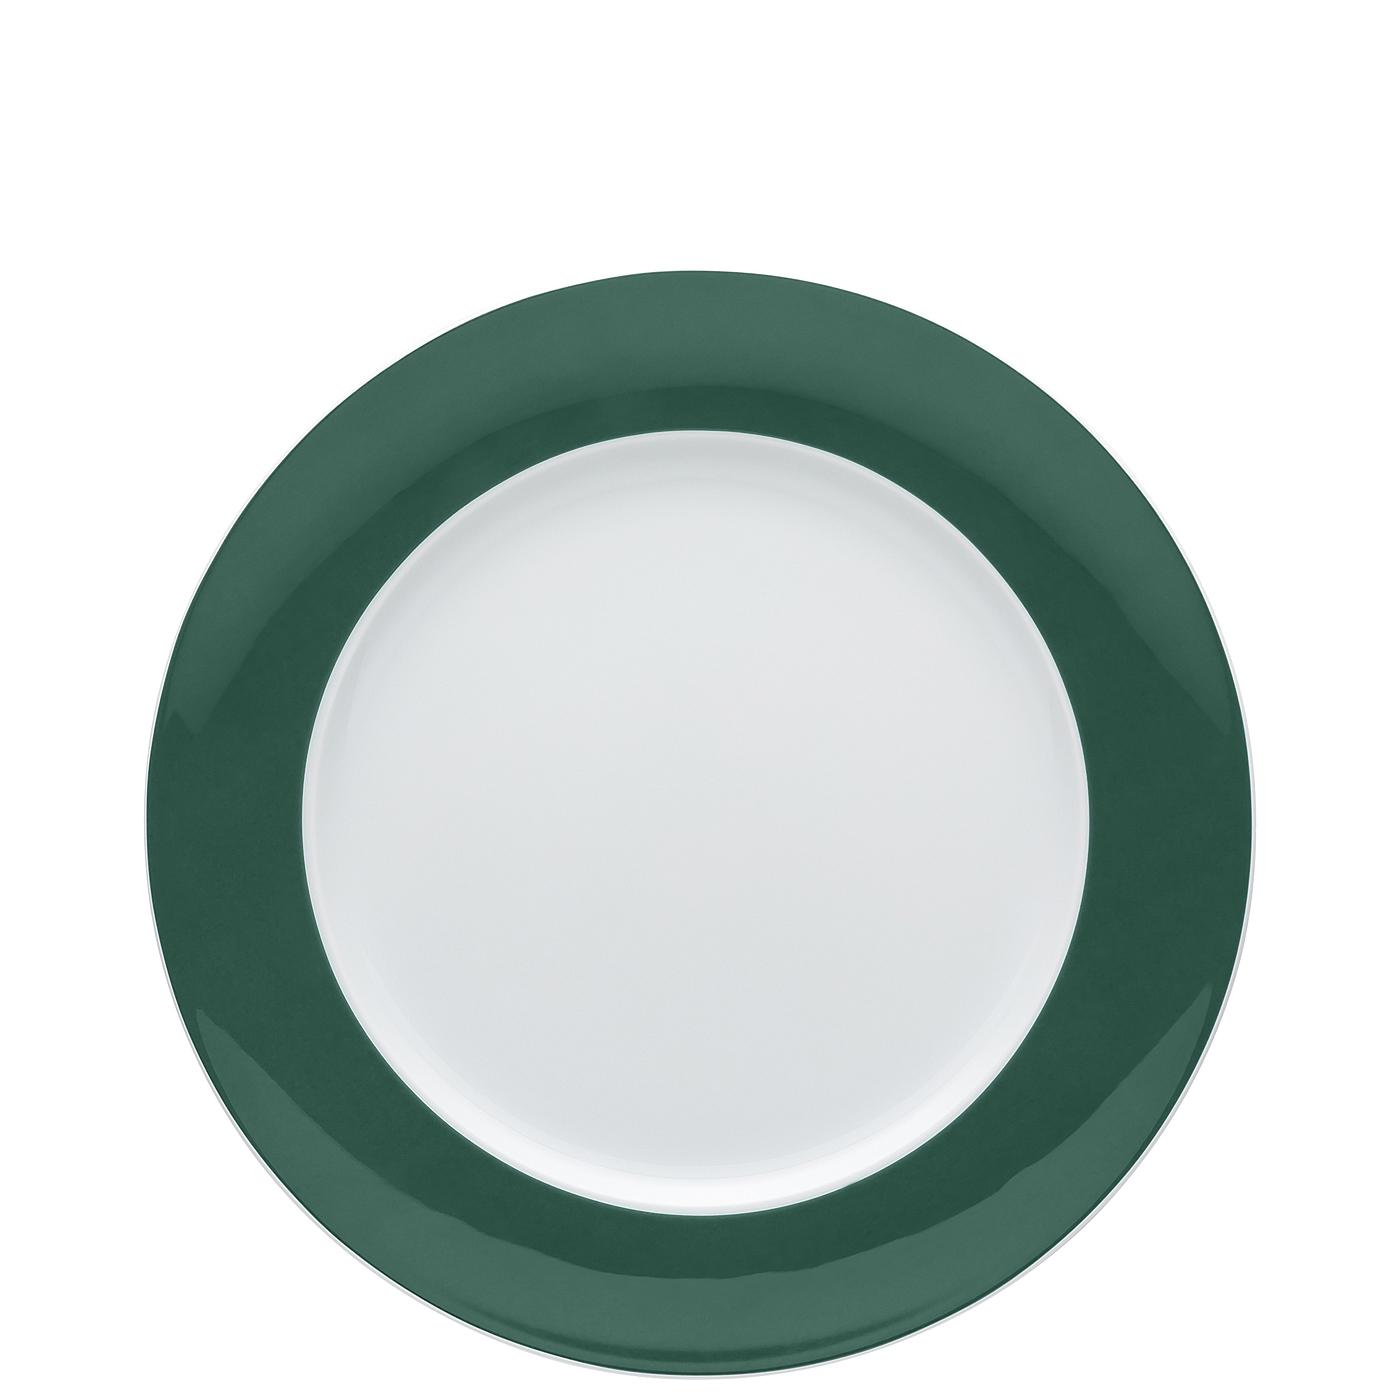 Speiseteller 27 cm Sunny Day Herbal Green Thomas Porzellan